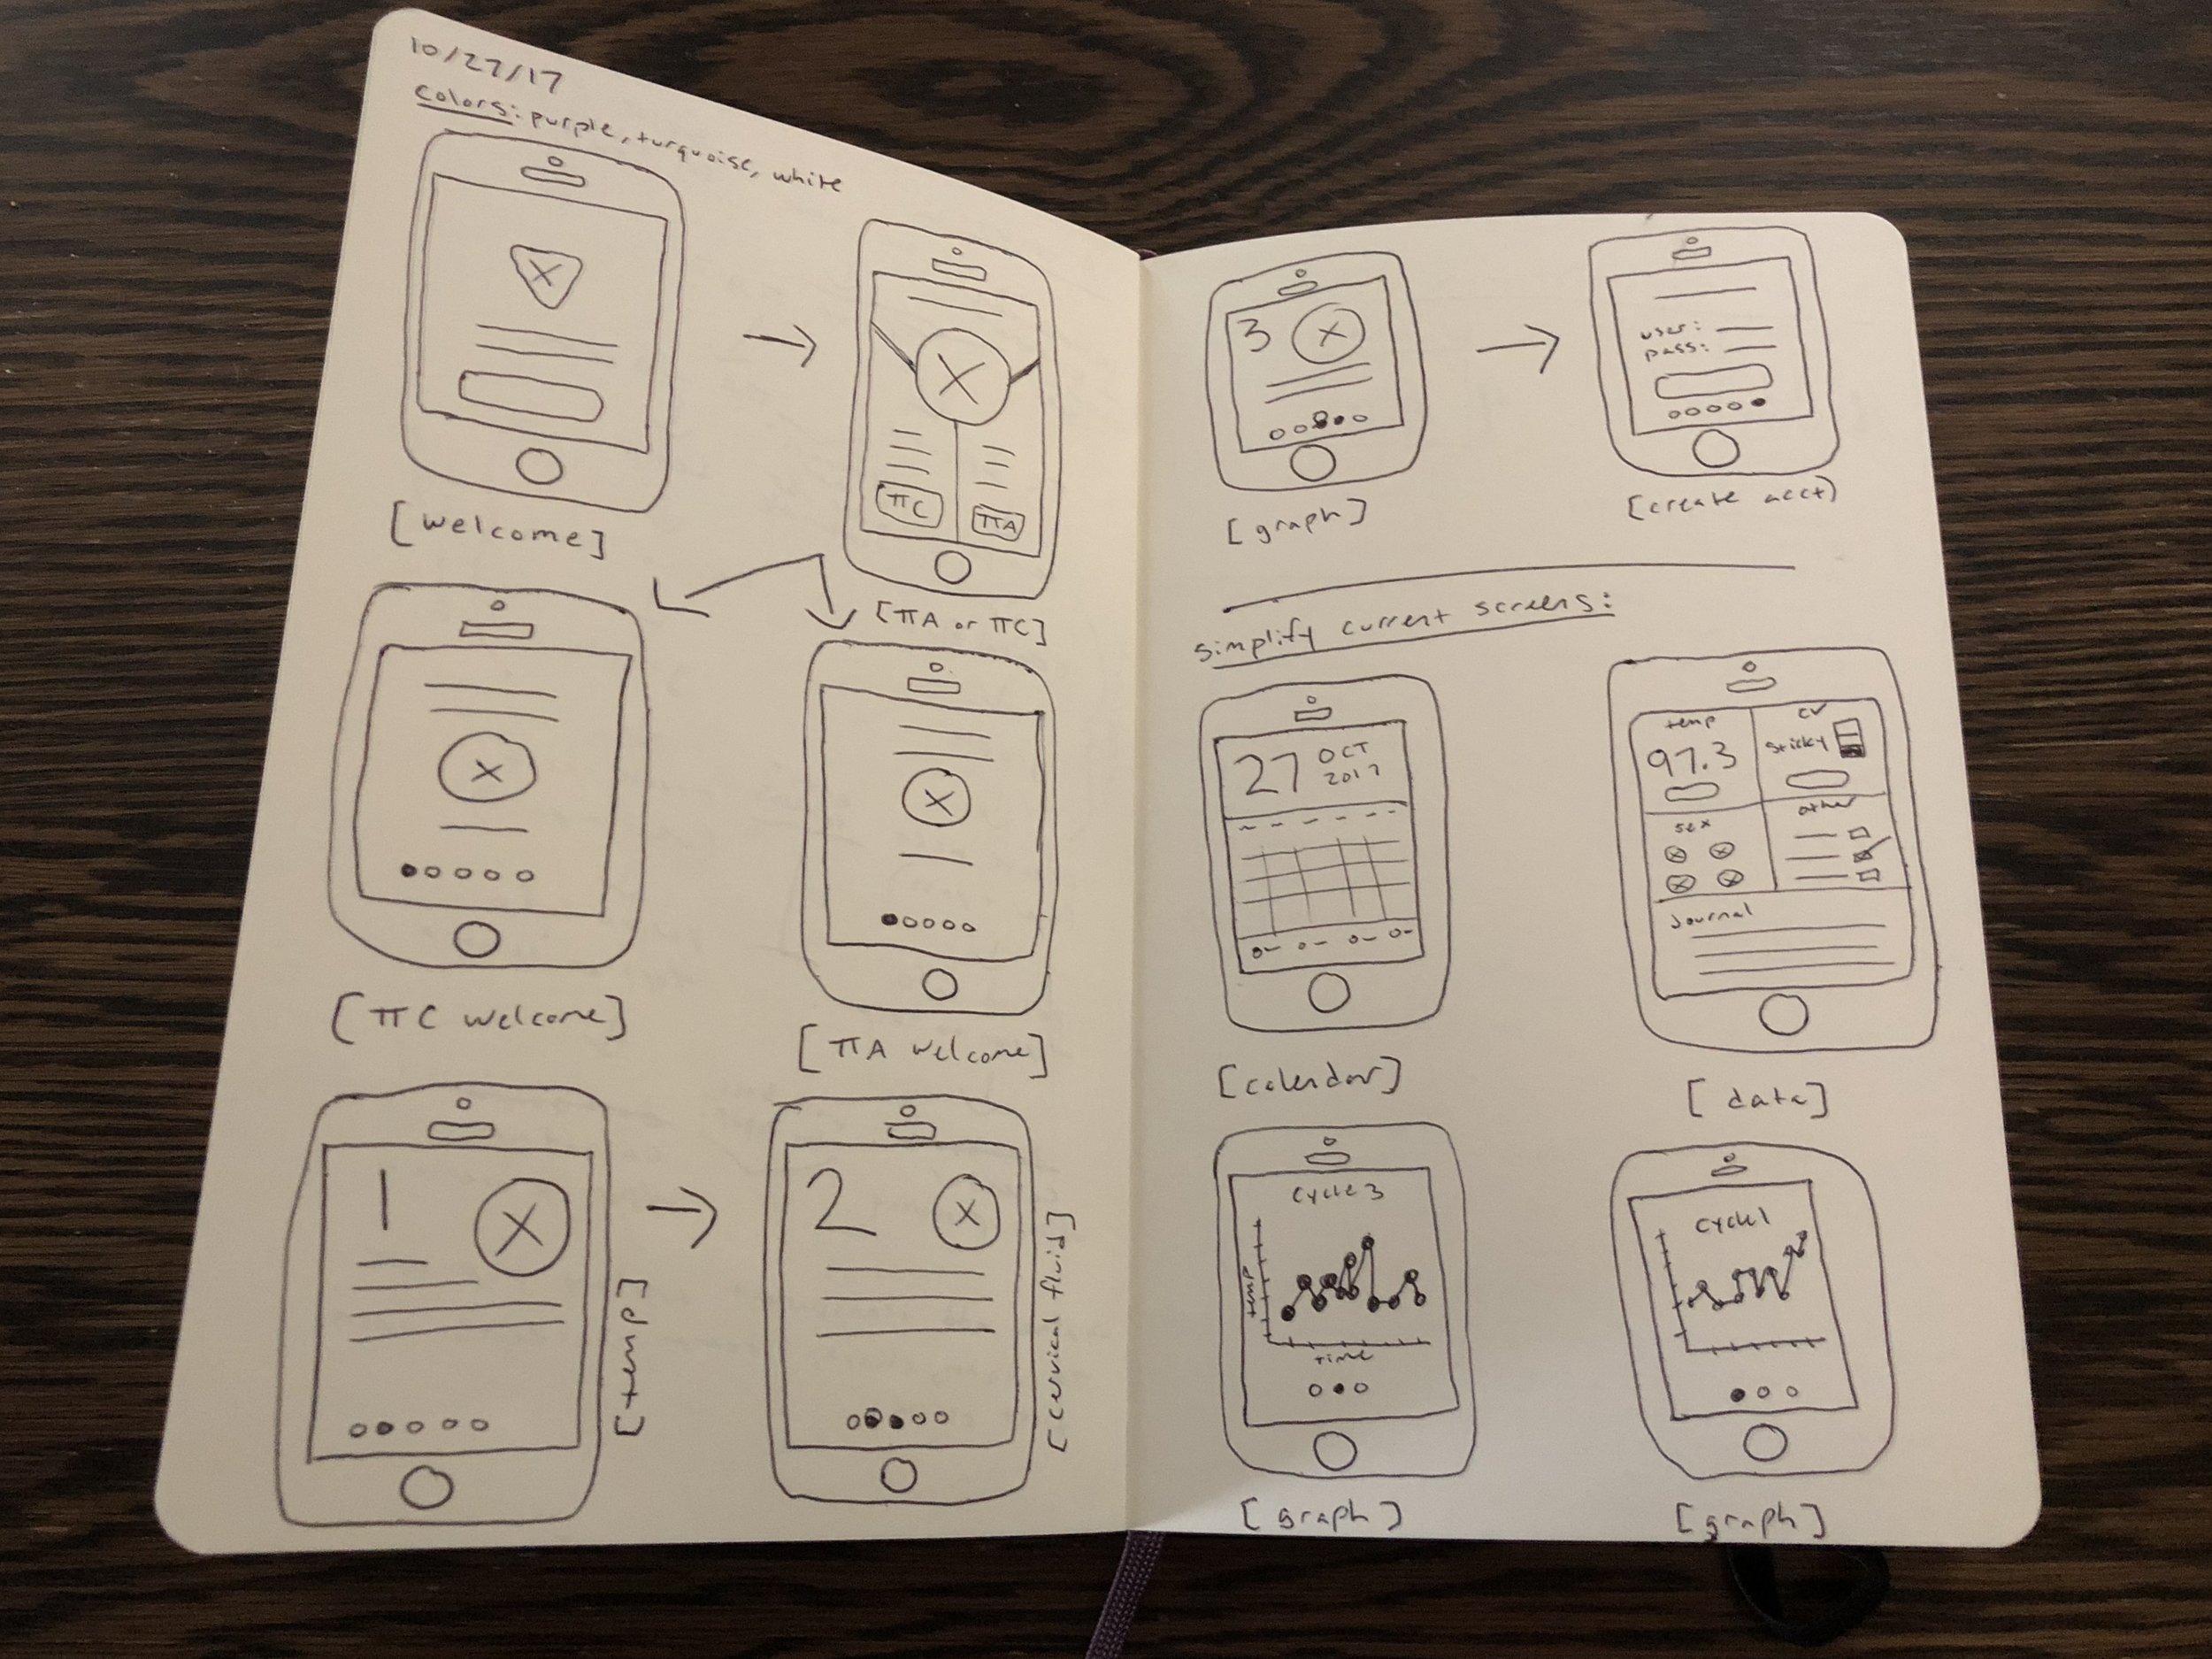 screen-sketches.JPG